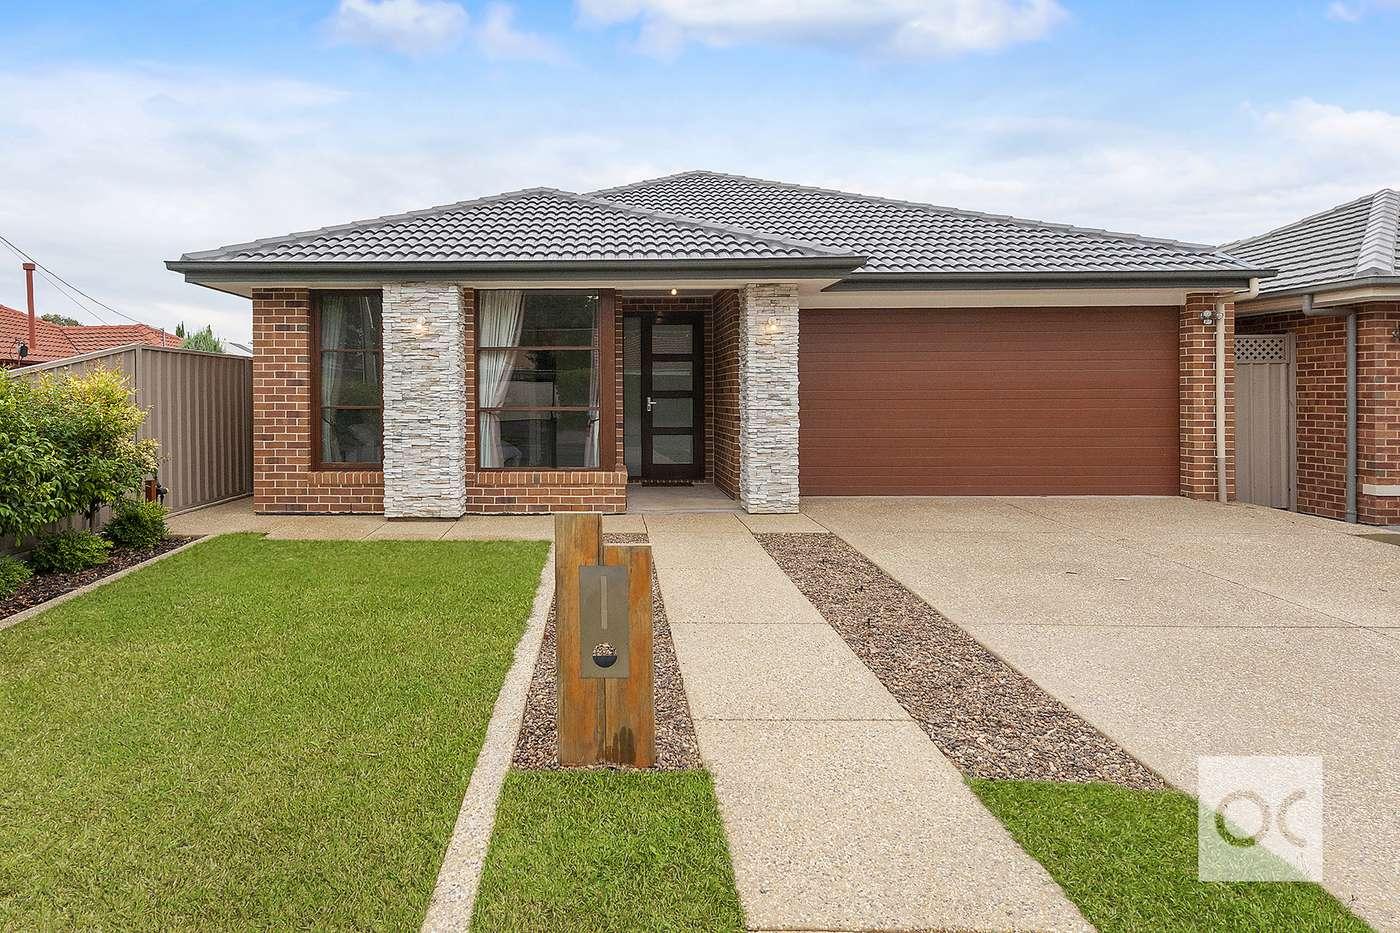 Main view of Homely house listing, 66a Ann Street, Campbelltown, SA 5074